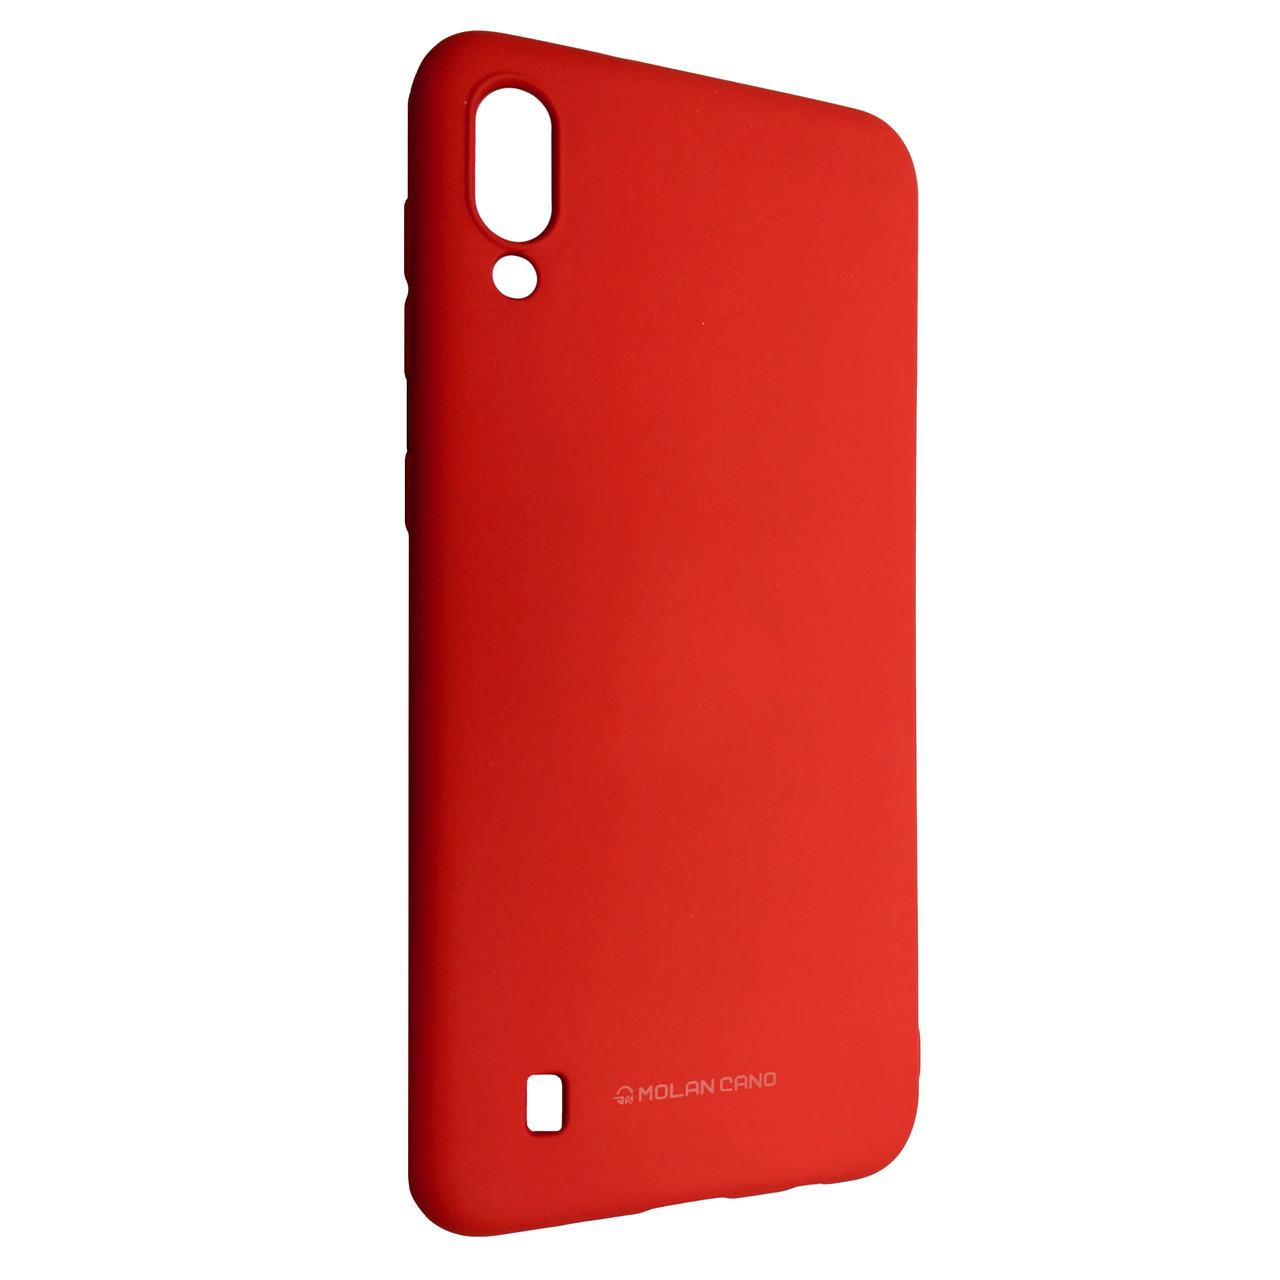 Чехол Silicone Hana Molan Cano Samsung M10 (red)